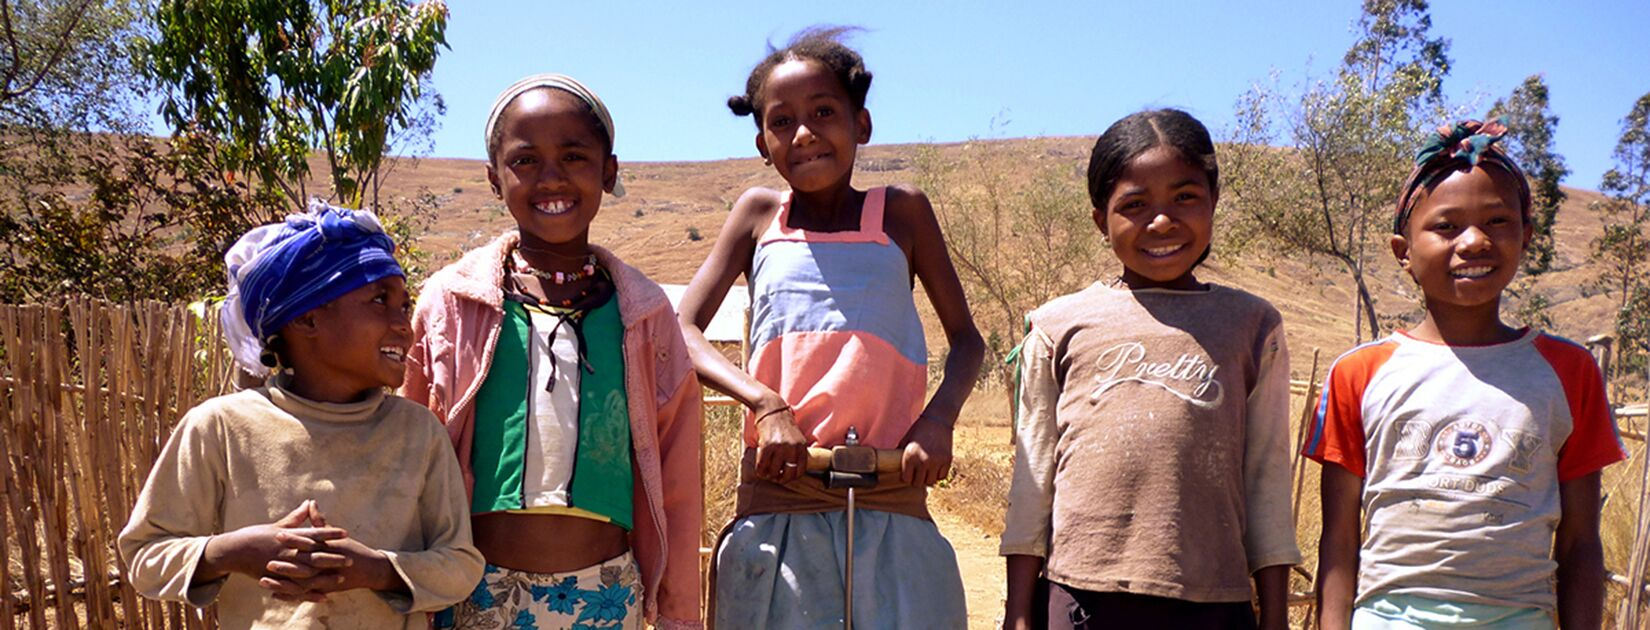 empowering women in Madagascar